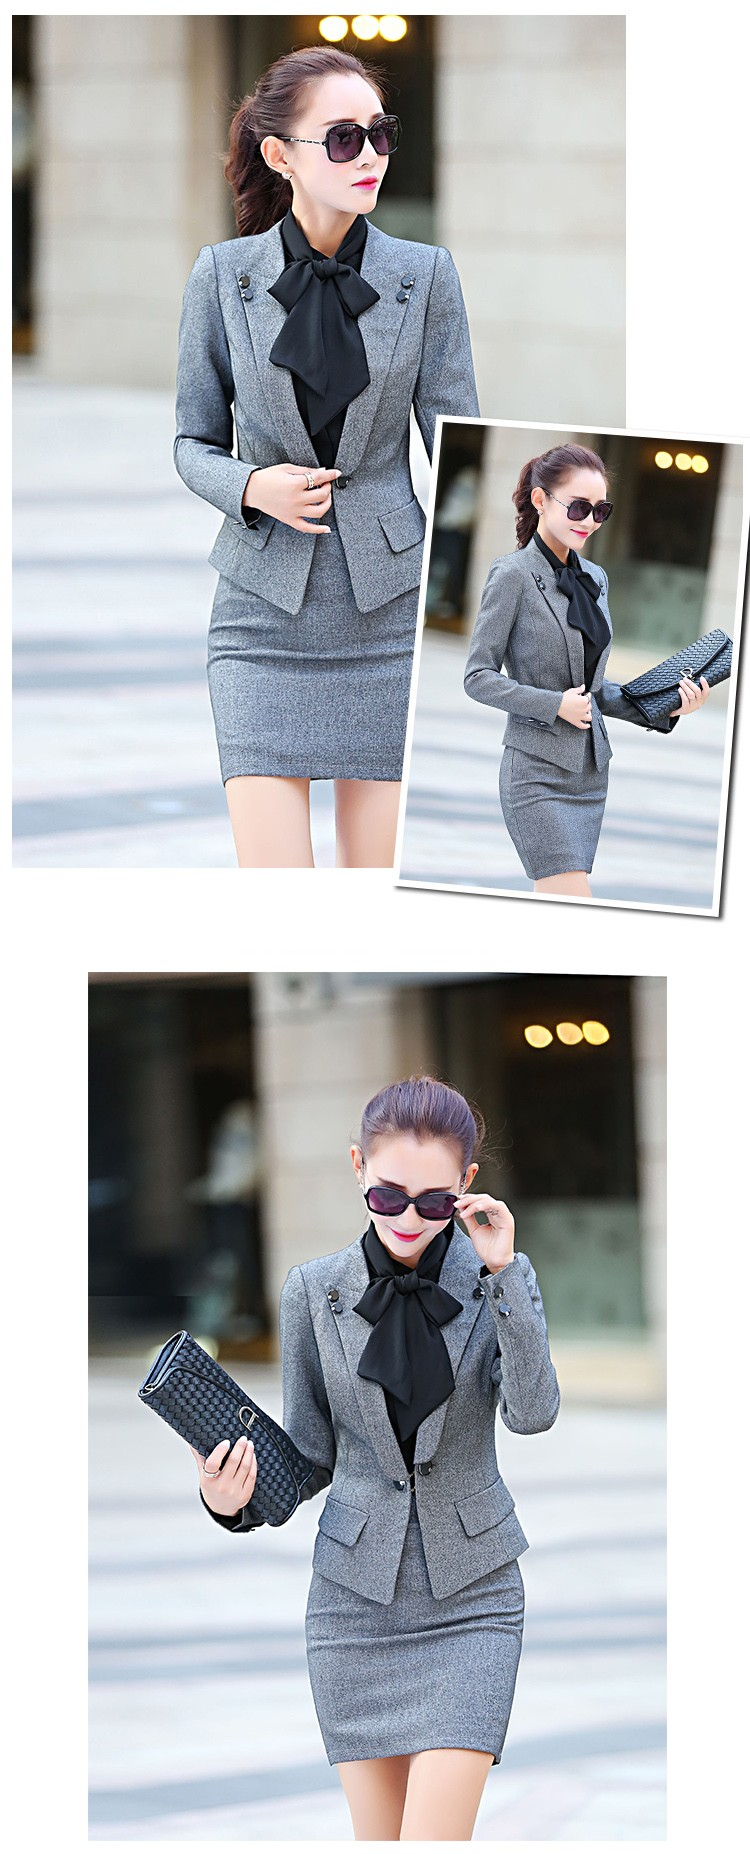 Neue Mode Frauen Casual Blumendruck Blazer Anzug Damen Langarm Jacke Buy Korea Mode Langen Mantel,Damen Flügelhülse Mäntel,Frau Mäntel Und Jacken